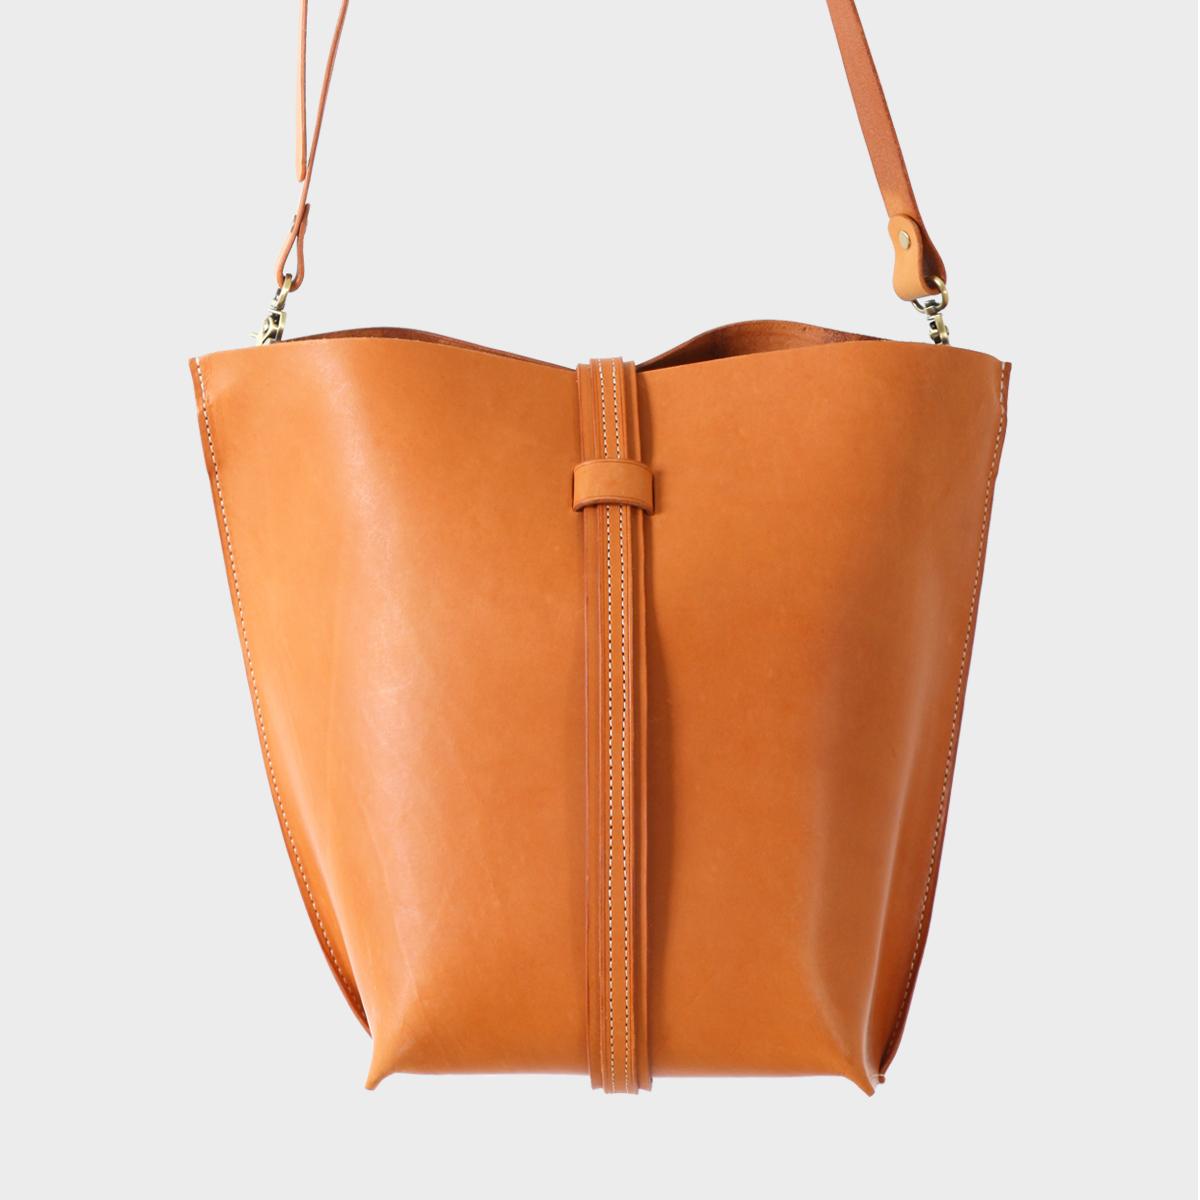 插帶托特包Belt Tote Bag NT$ 5,280  HDA0012